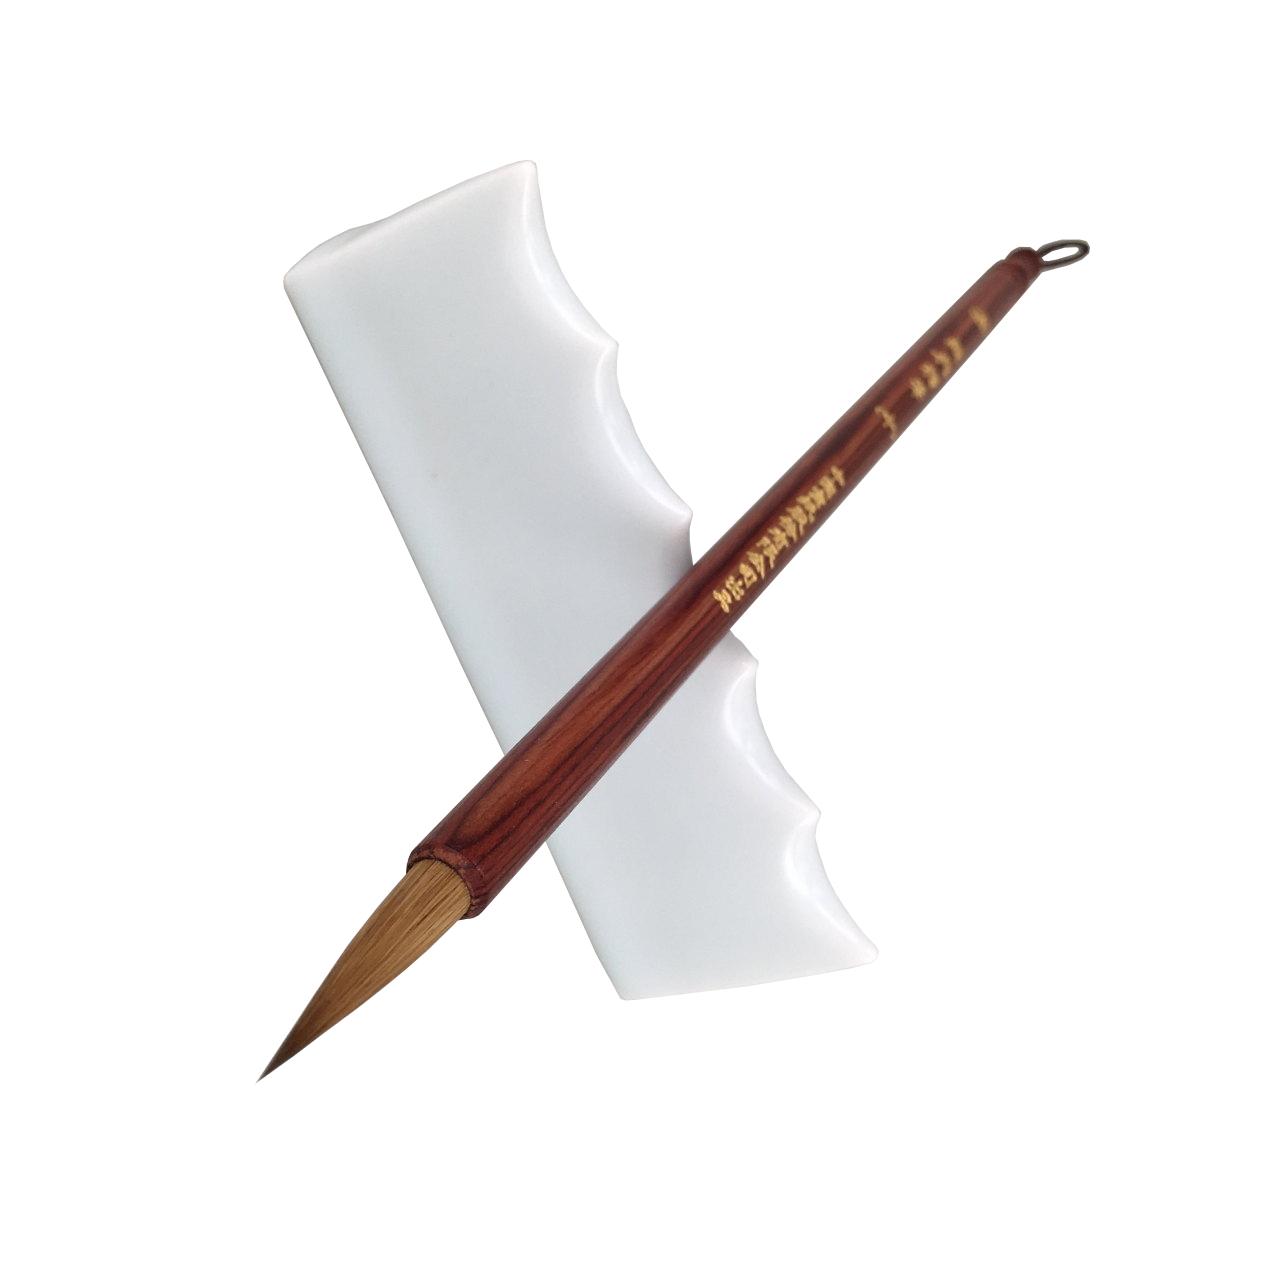 INKSTON Red Star \u7ecf\u5178\u6977\u7b14 Classic Calligraphy Lang Hao Wolf Brush Set